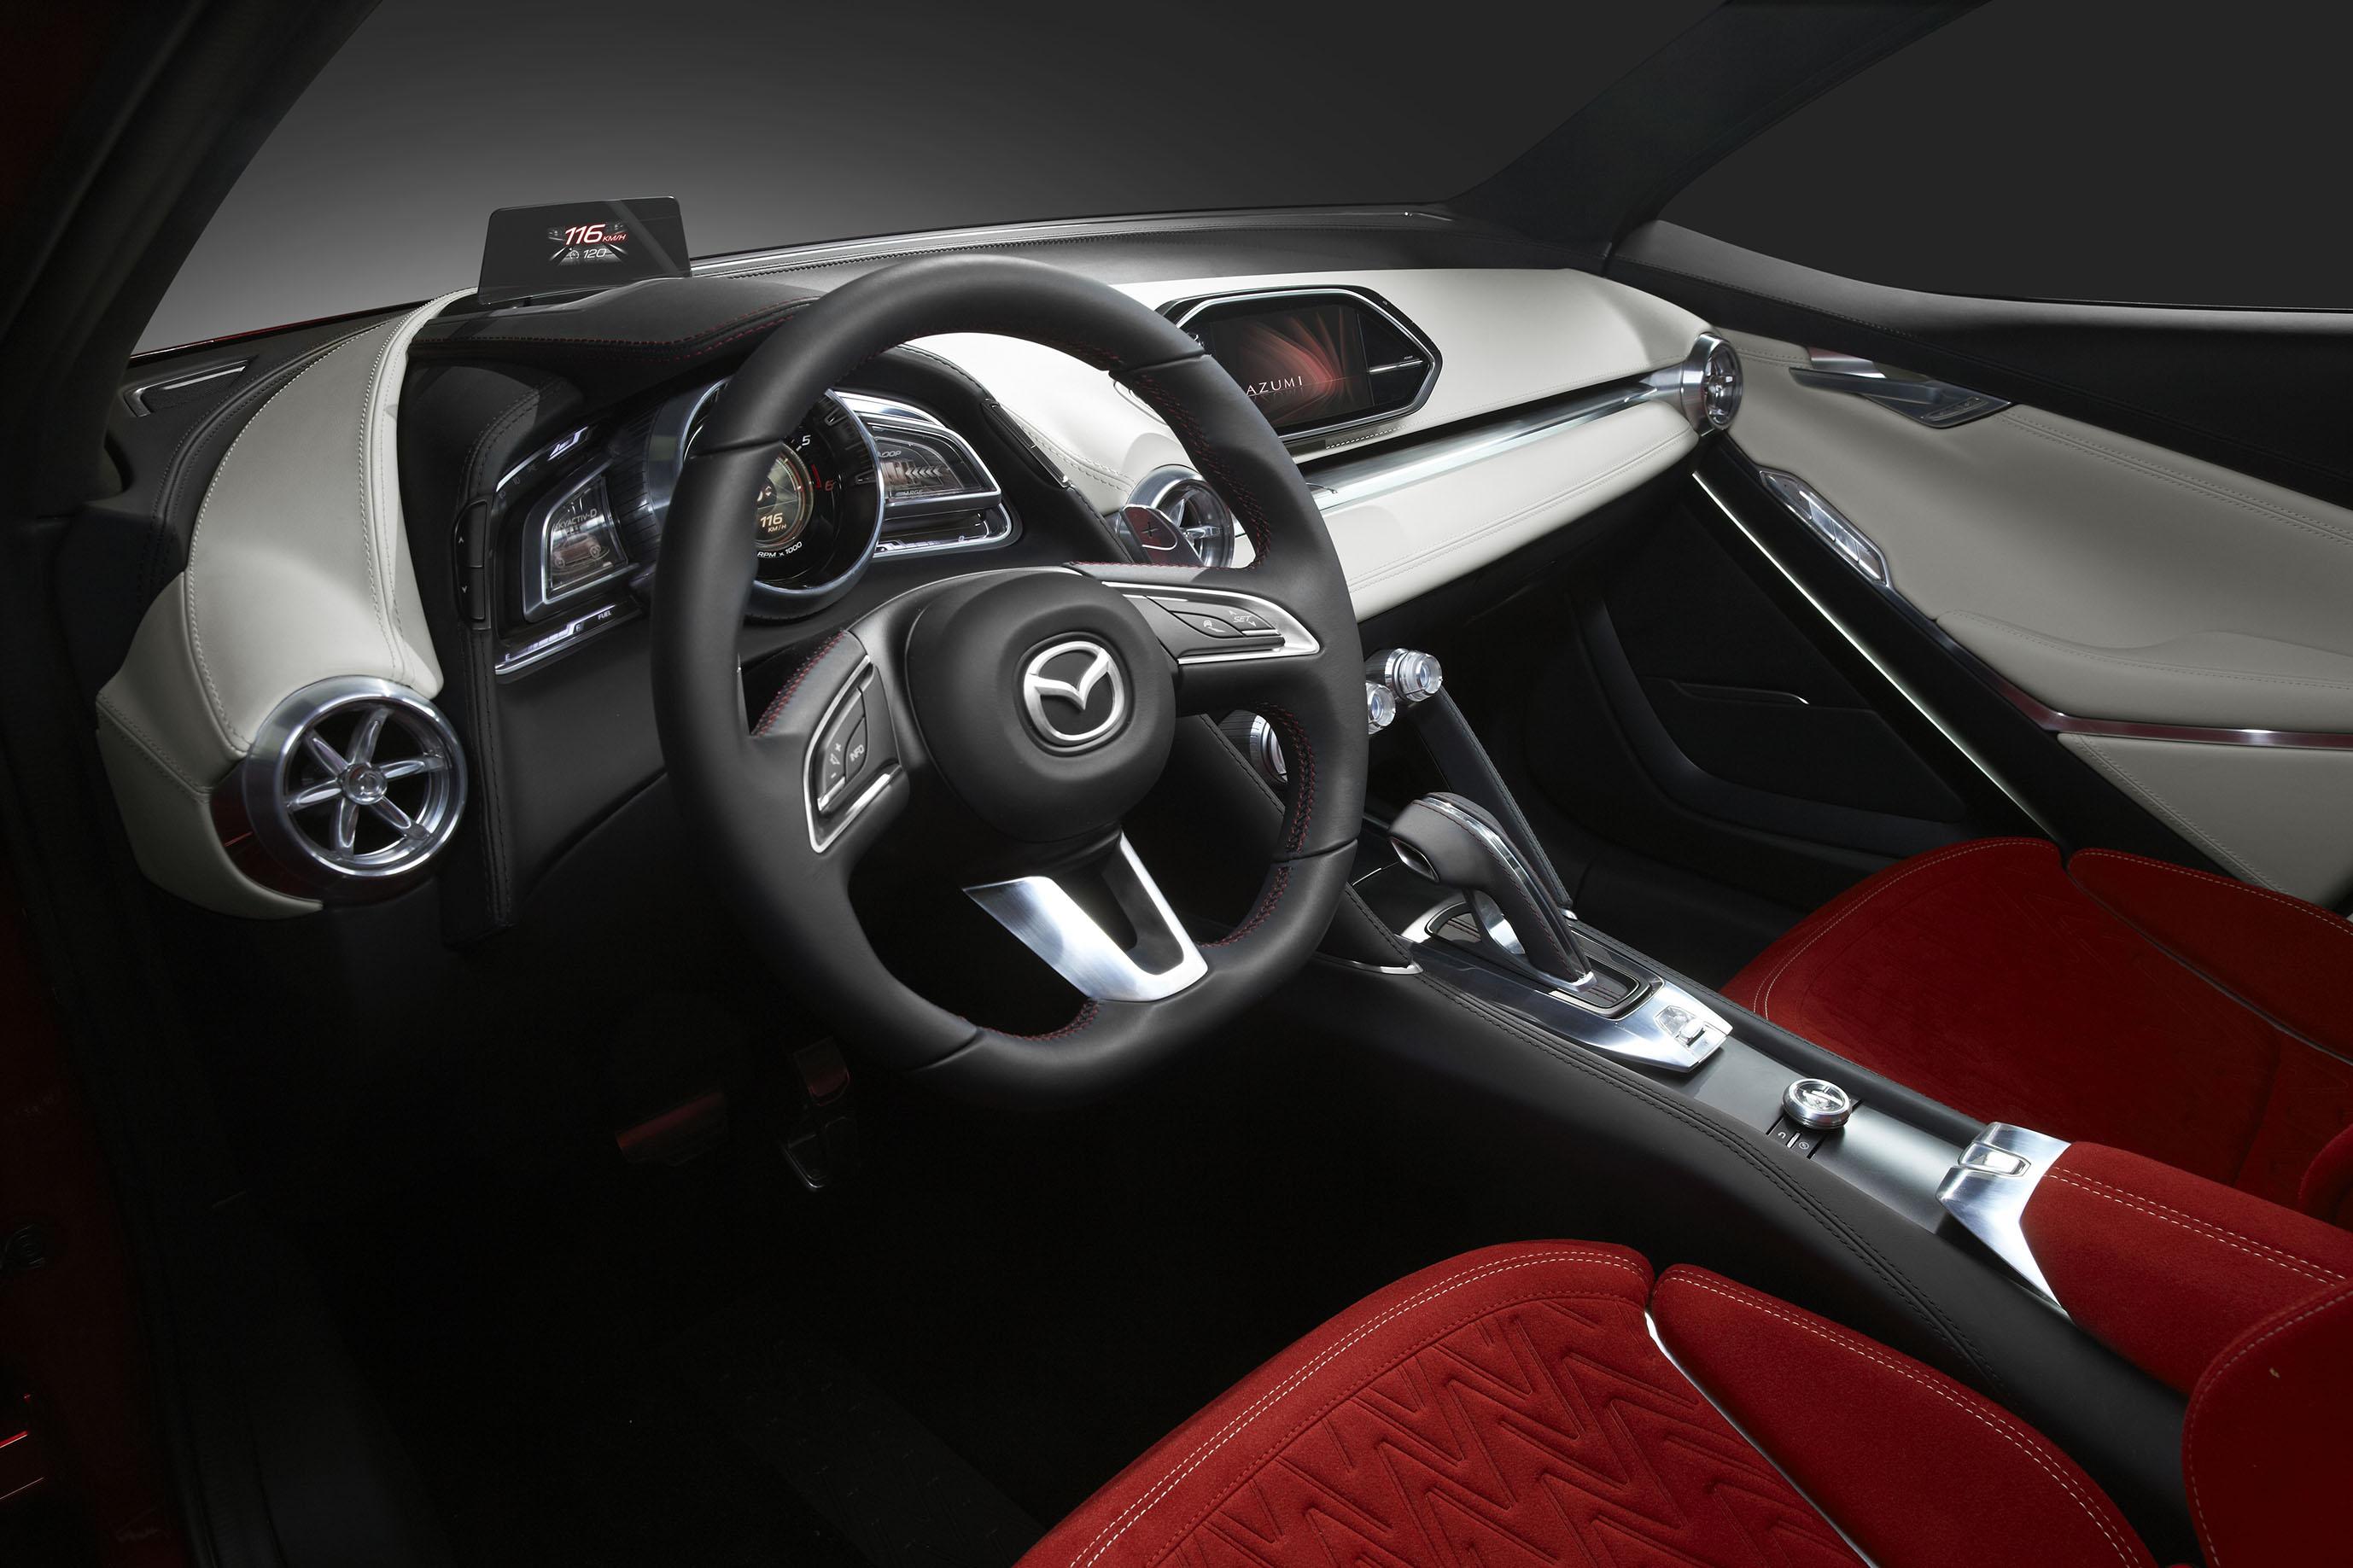 2014 Mazda Hazumi - Concepts